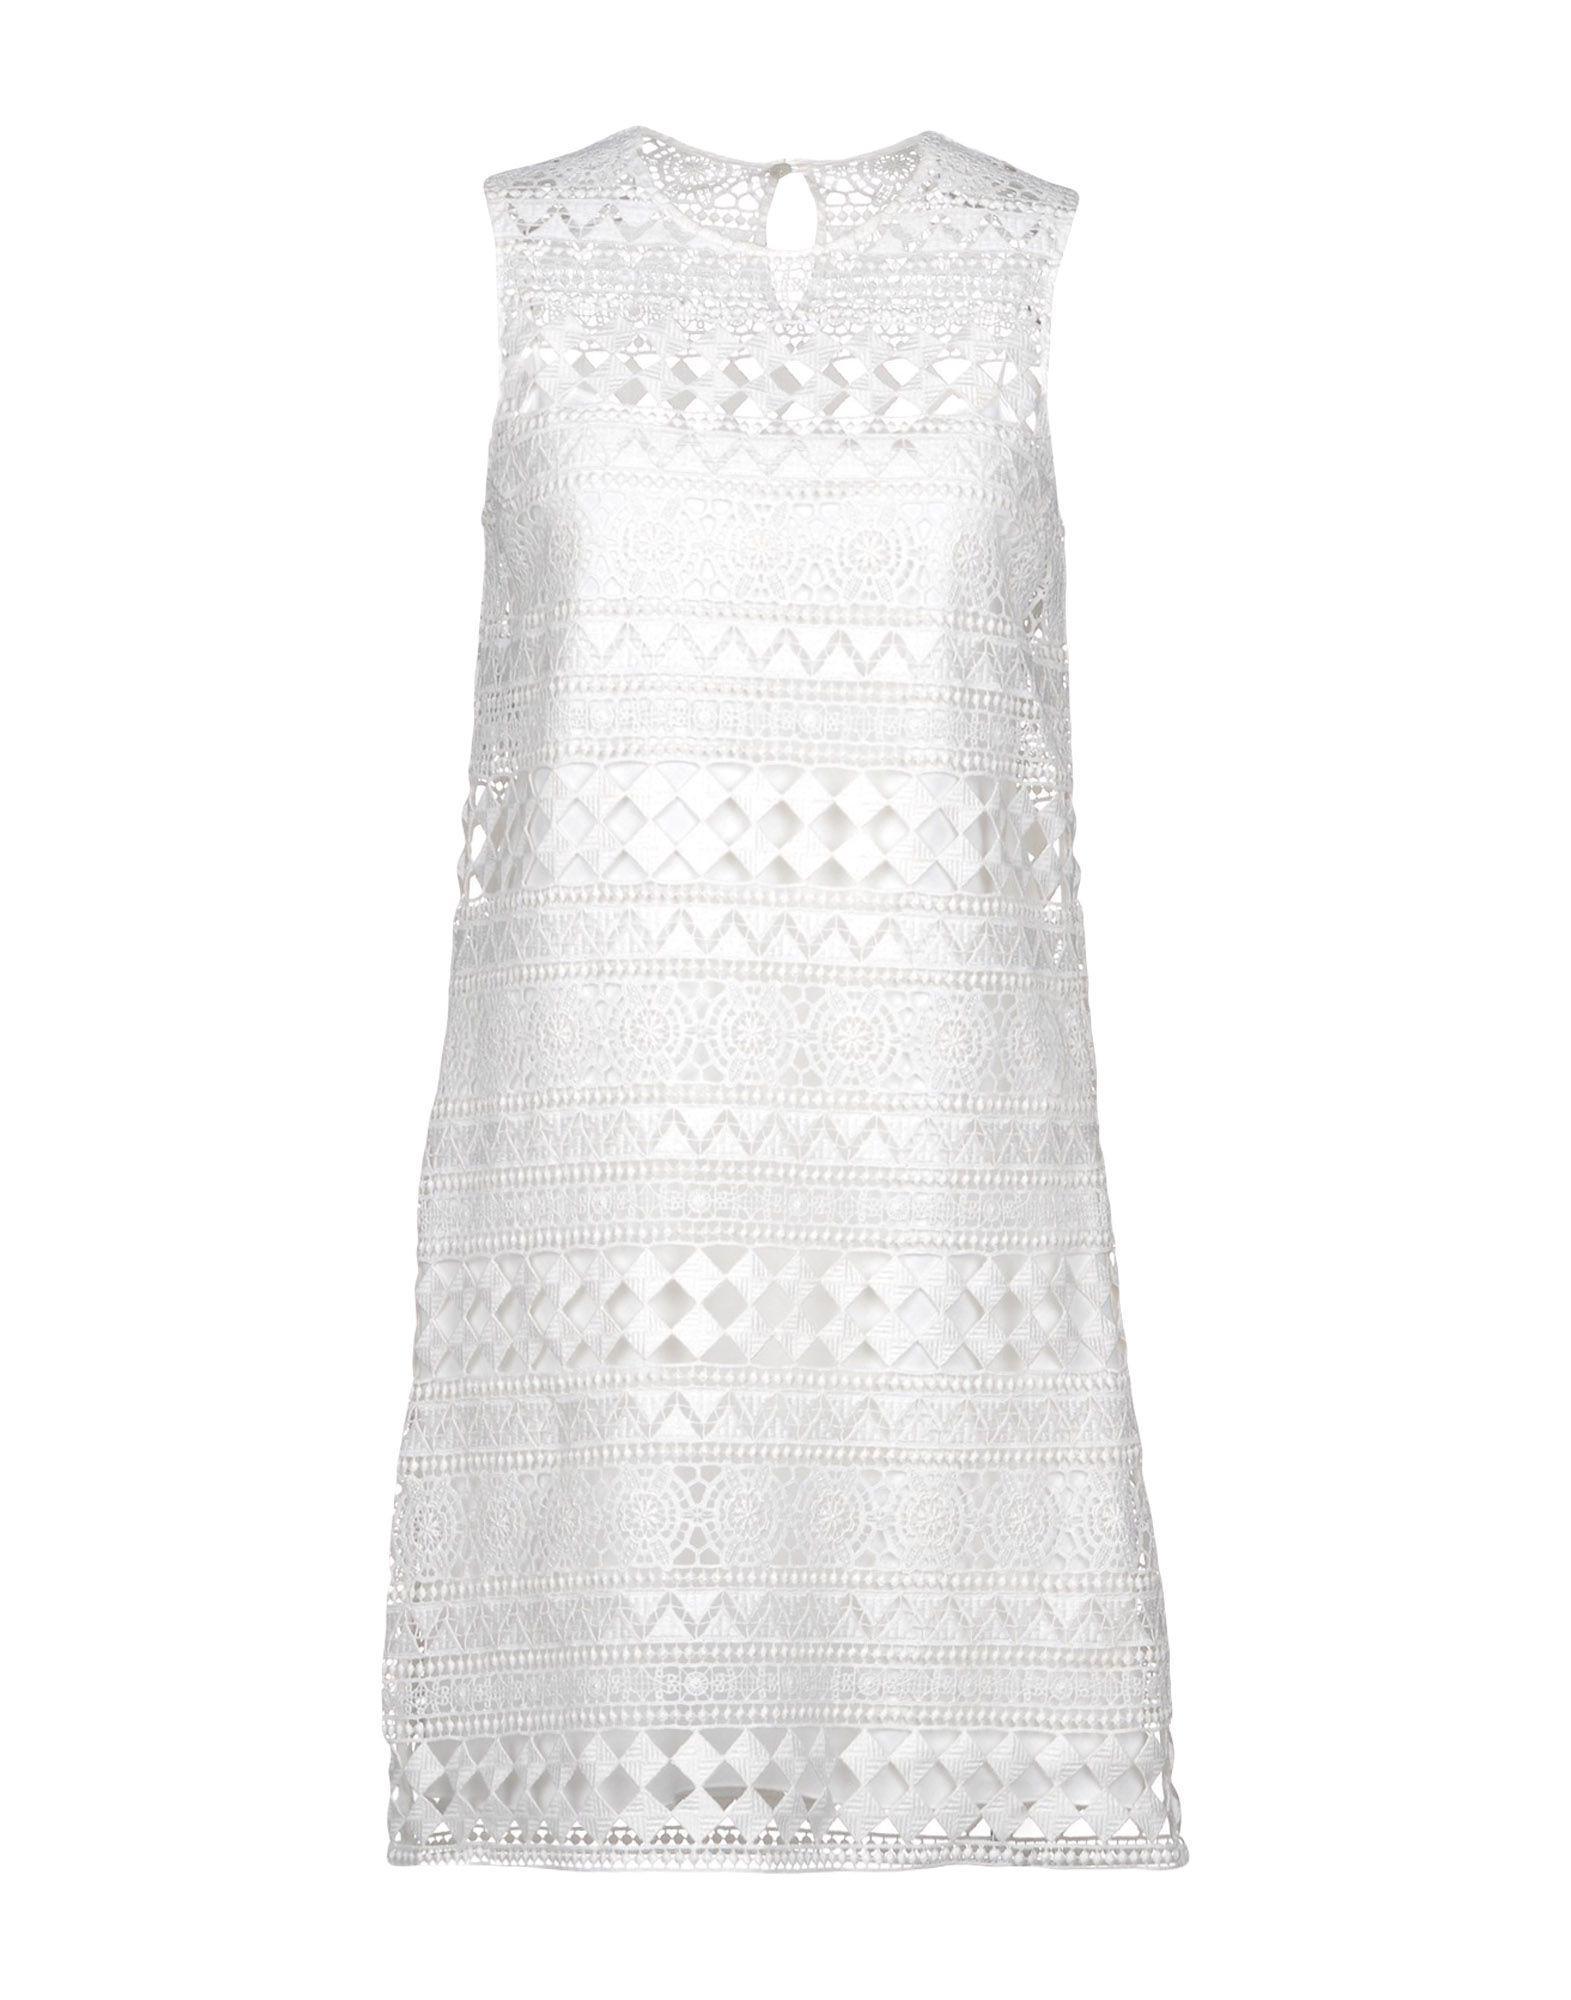 Philosophy Di Lorenzo Serafini Short Dress In White